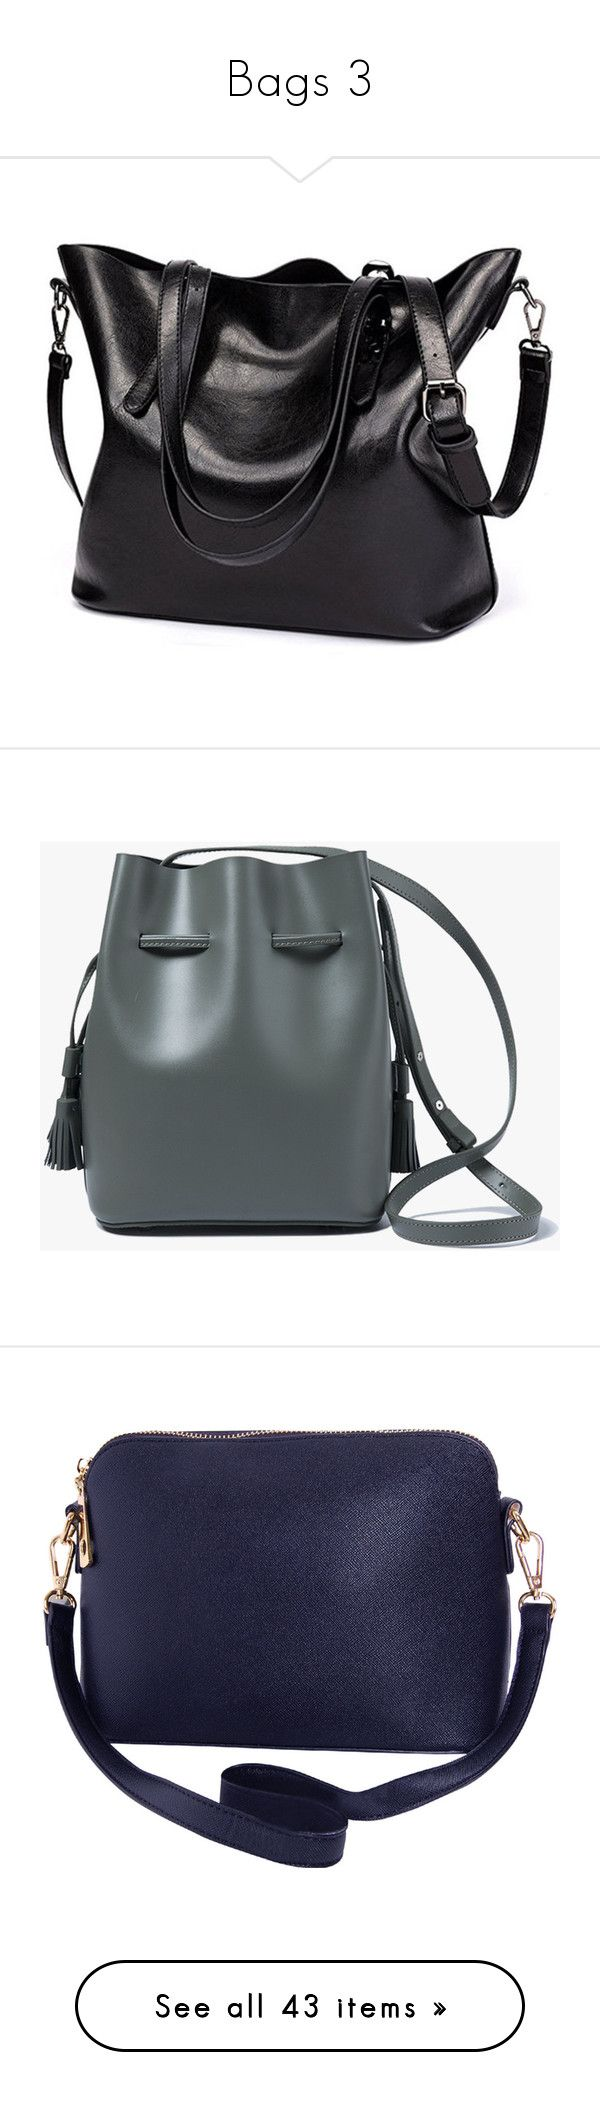 """Bags 3"" by fangsandfashion ❤ liked on Polyvore featuring bags, handbags, shoulder bags, black, shoulder strap handbags, crossbody purses, fringe purse crossbody, nine west shoulder bag, hand bags and bolsas"